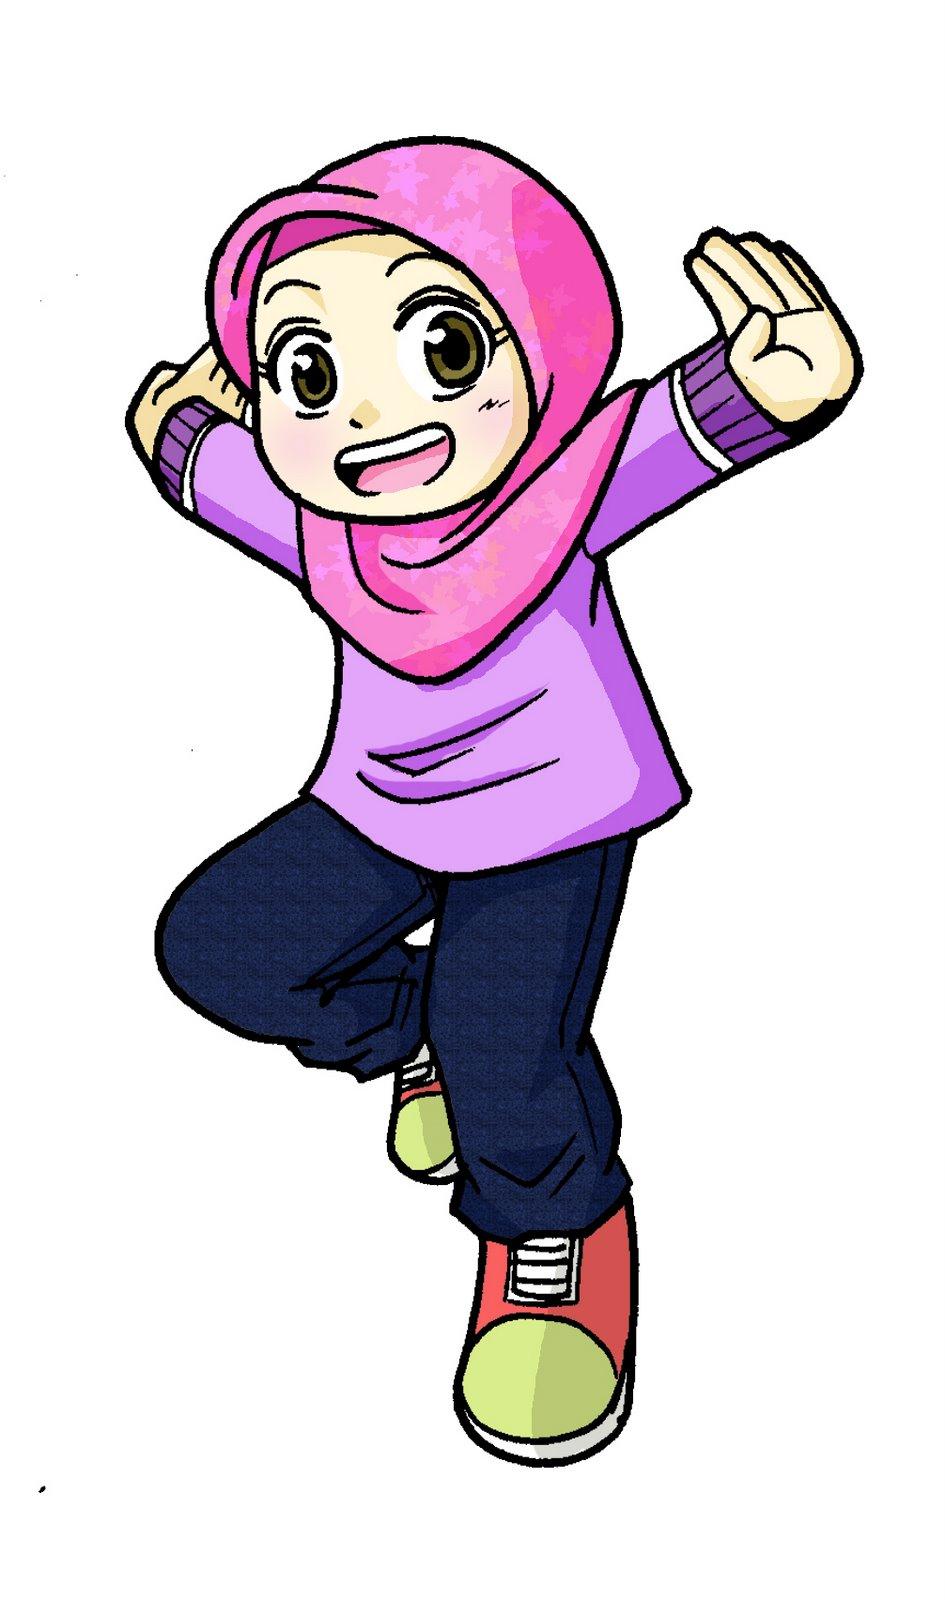 945x1600 Aisyah.jpg] Muslim Kids Muslim